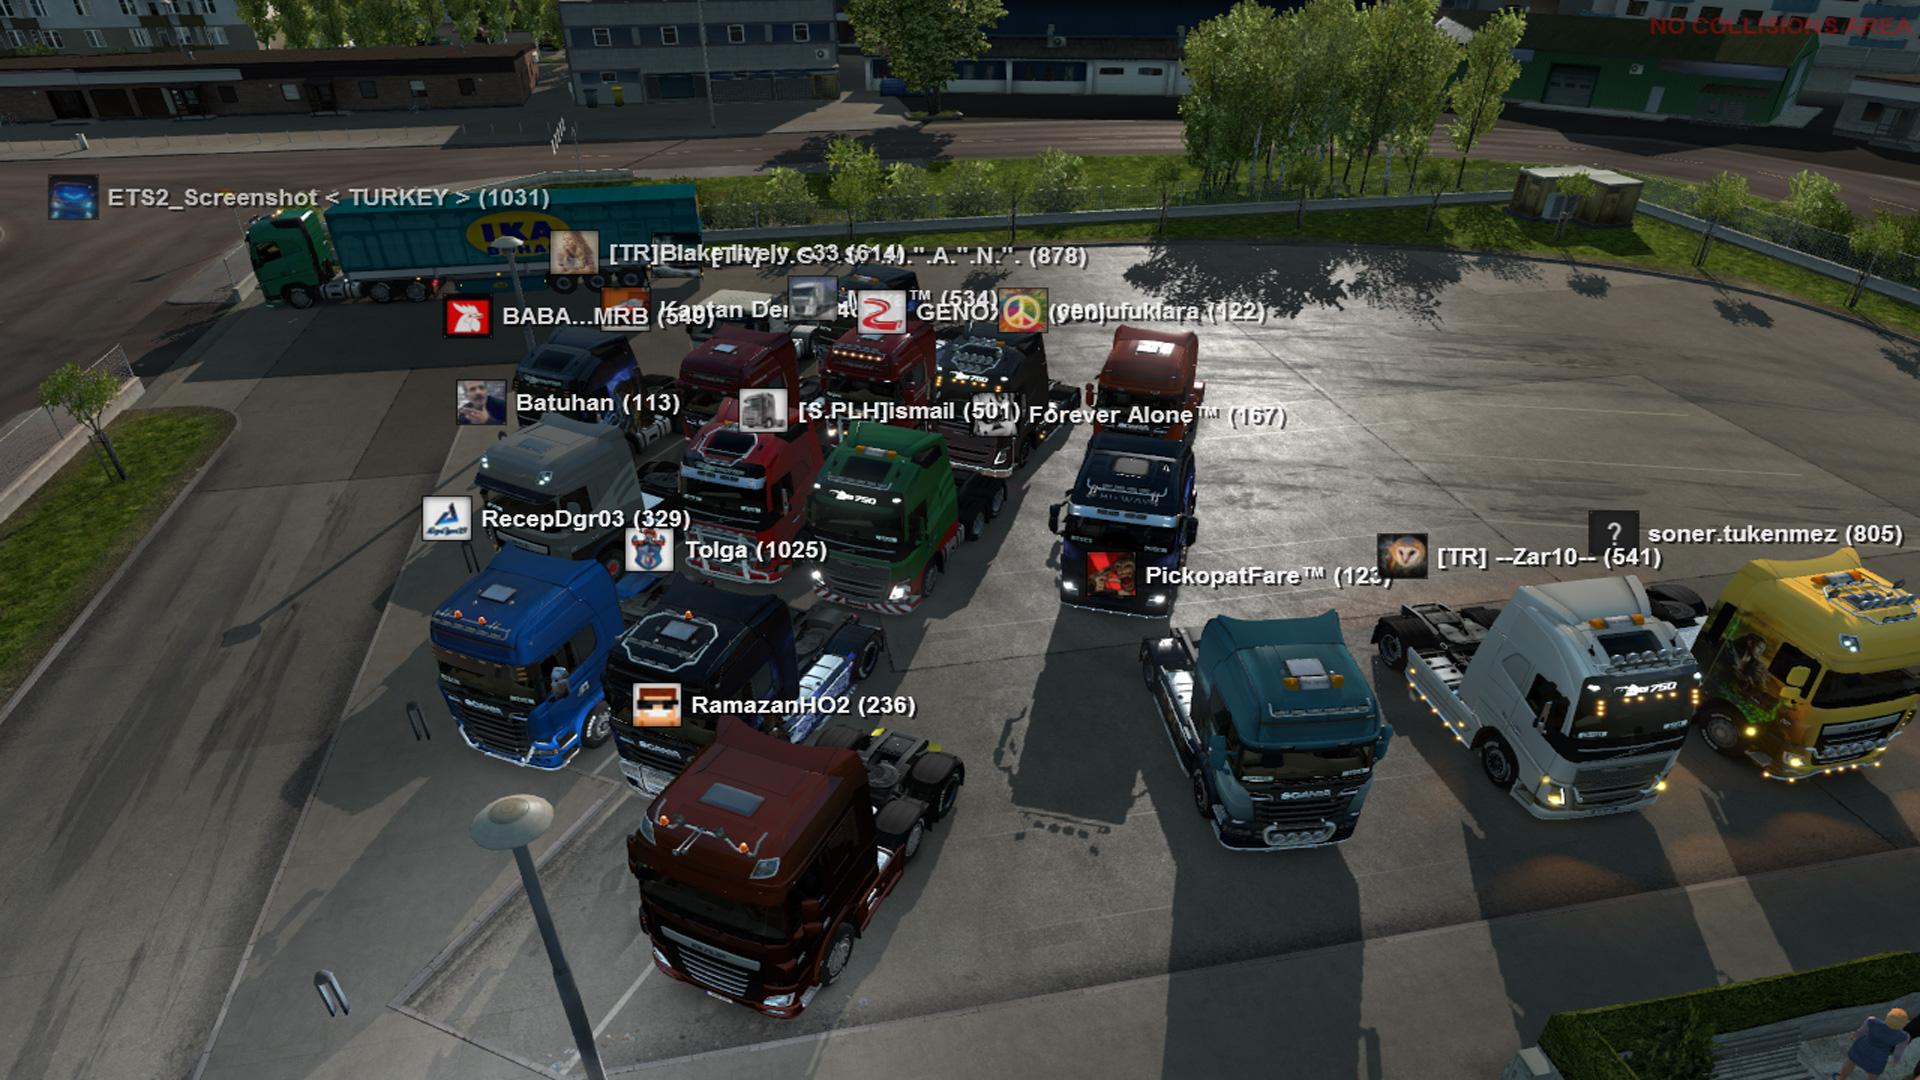 Euro truck simulator 2 multiplayer почему нет грузов